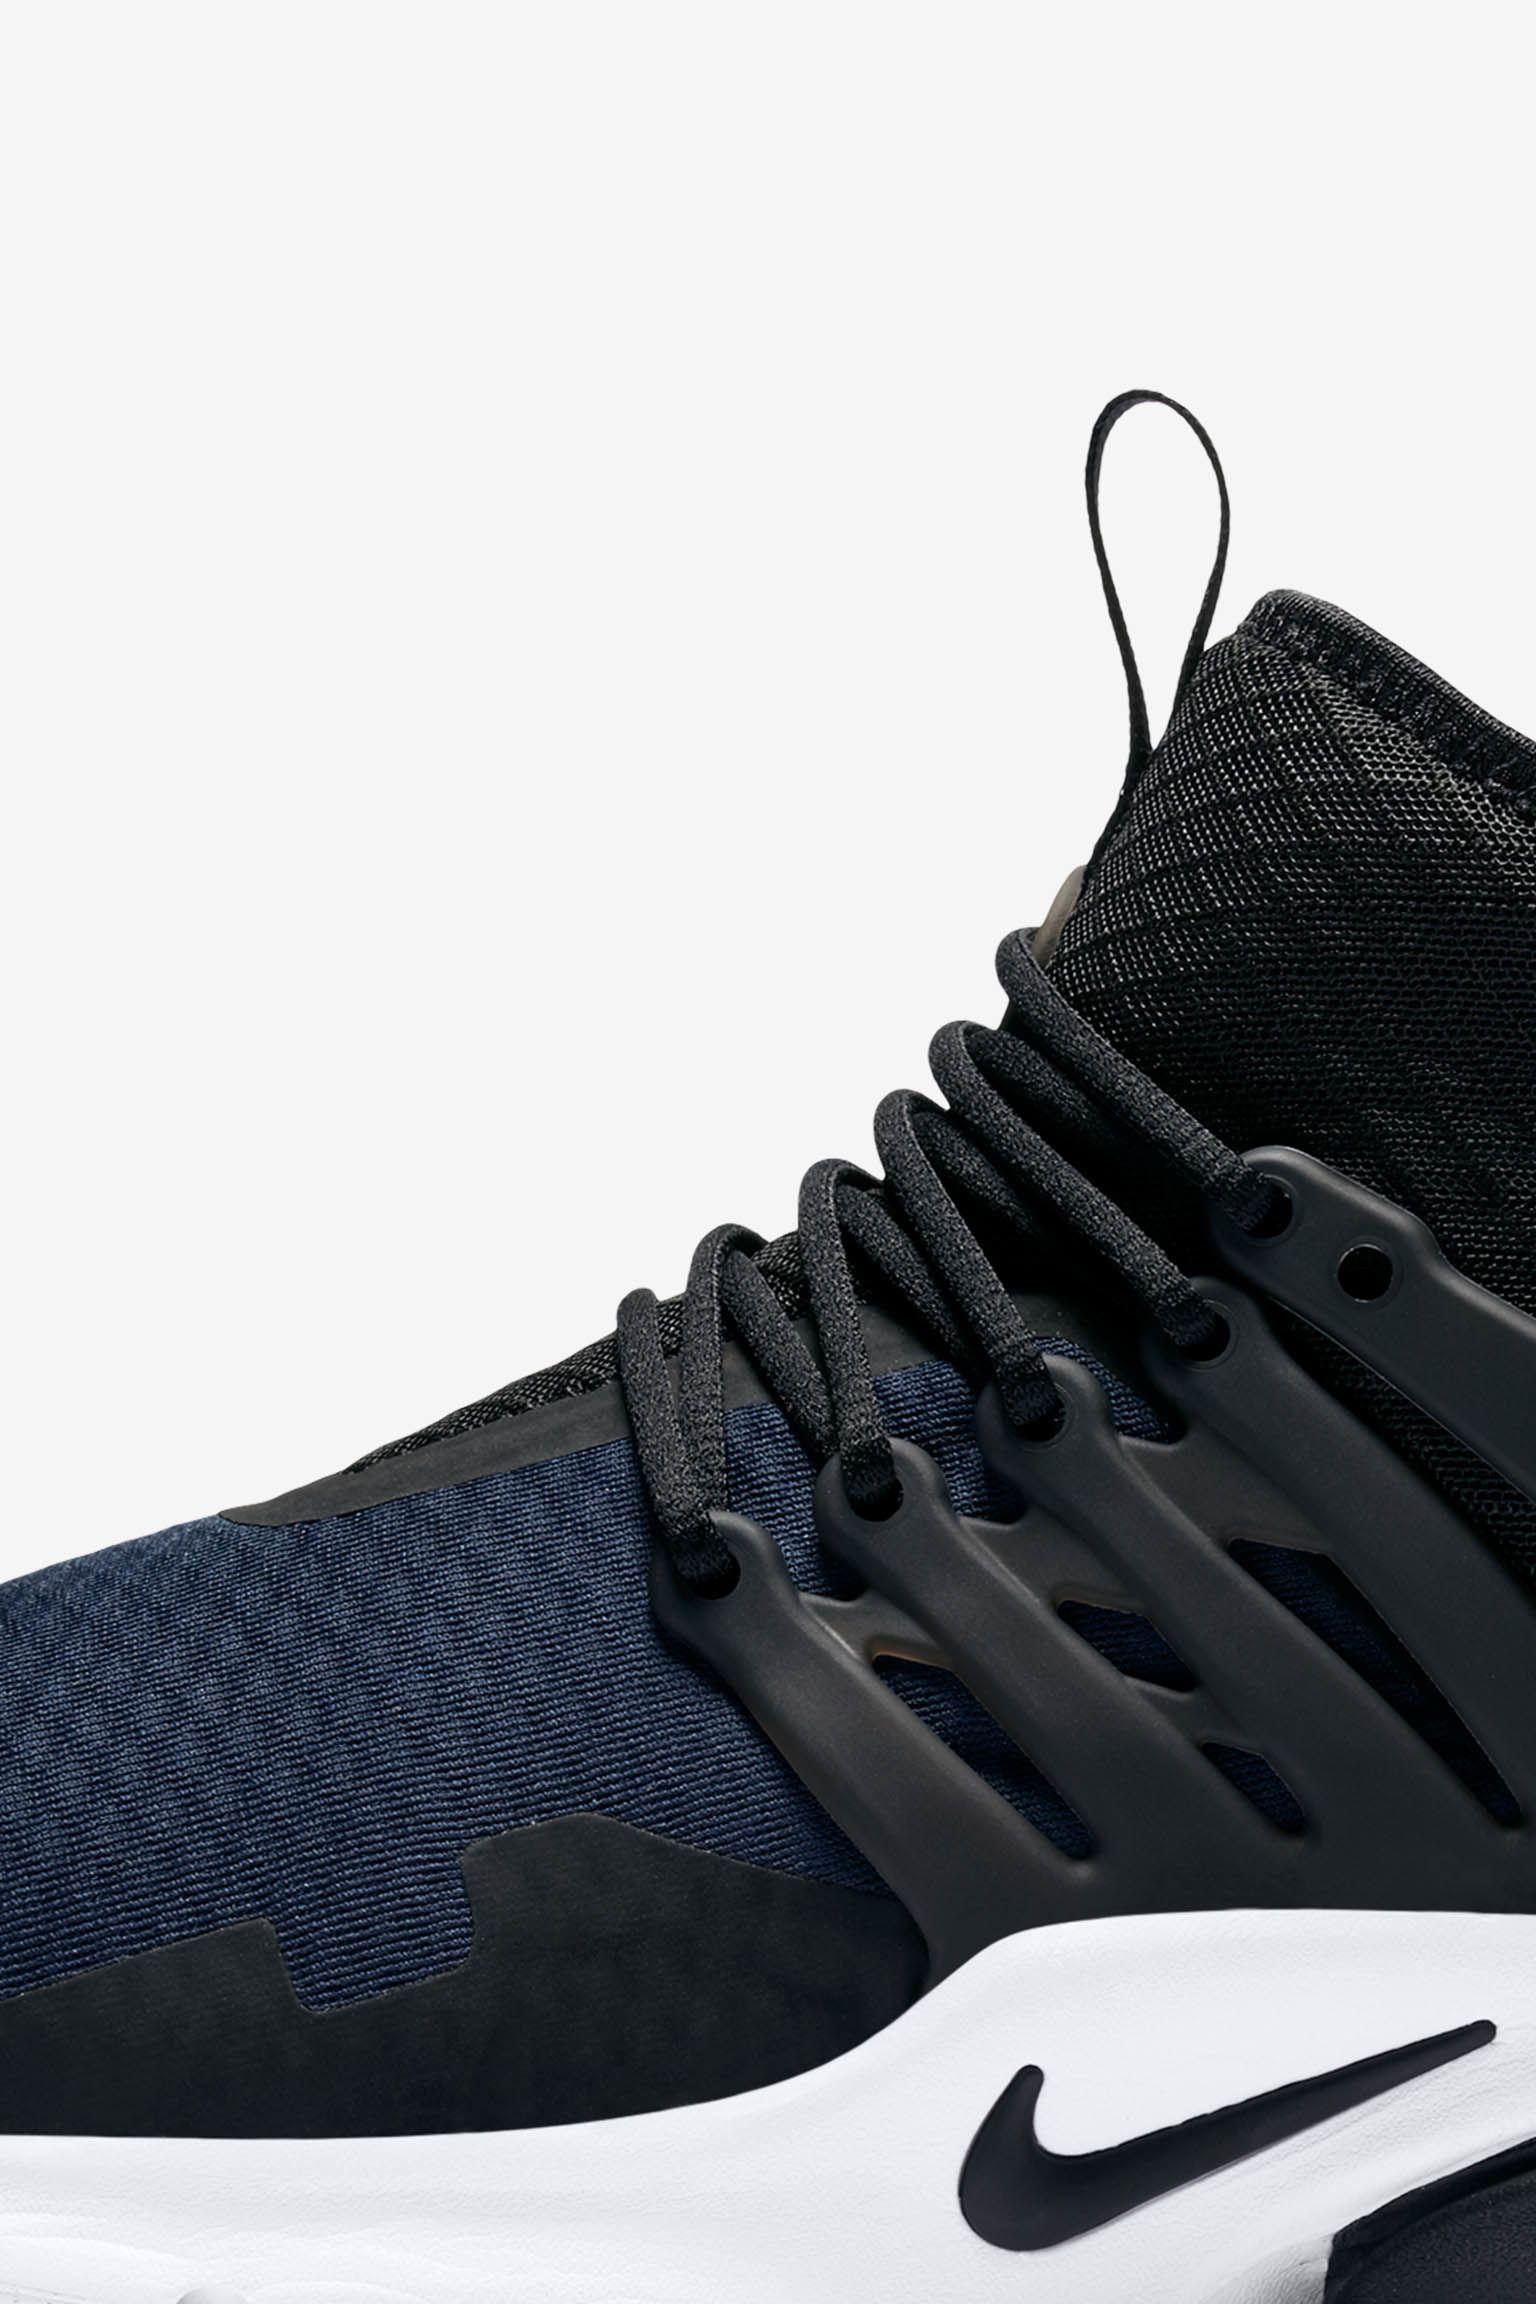 Nike Air Presto Mid Utility 'Black & Obsidian'